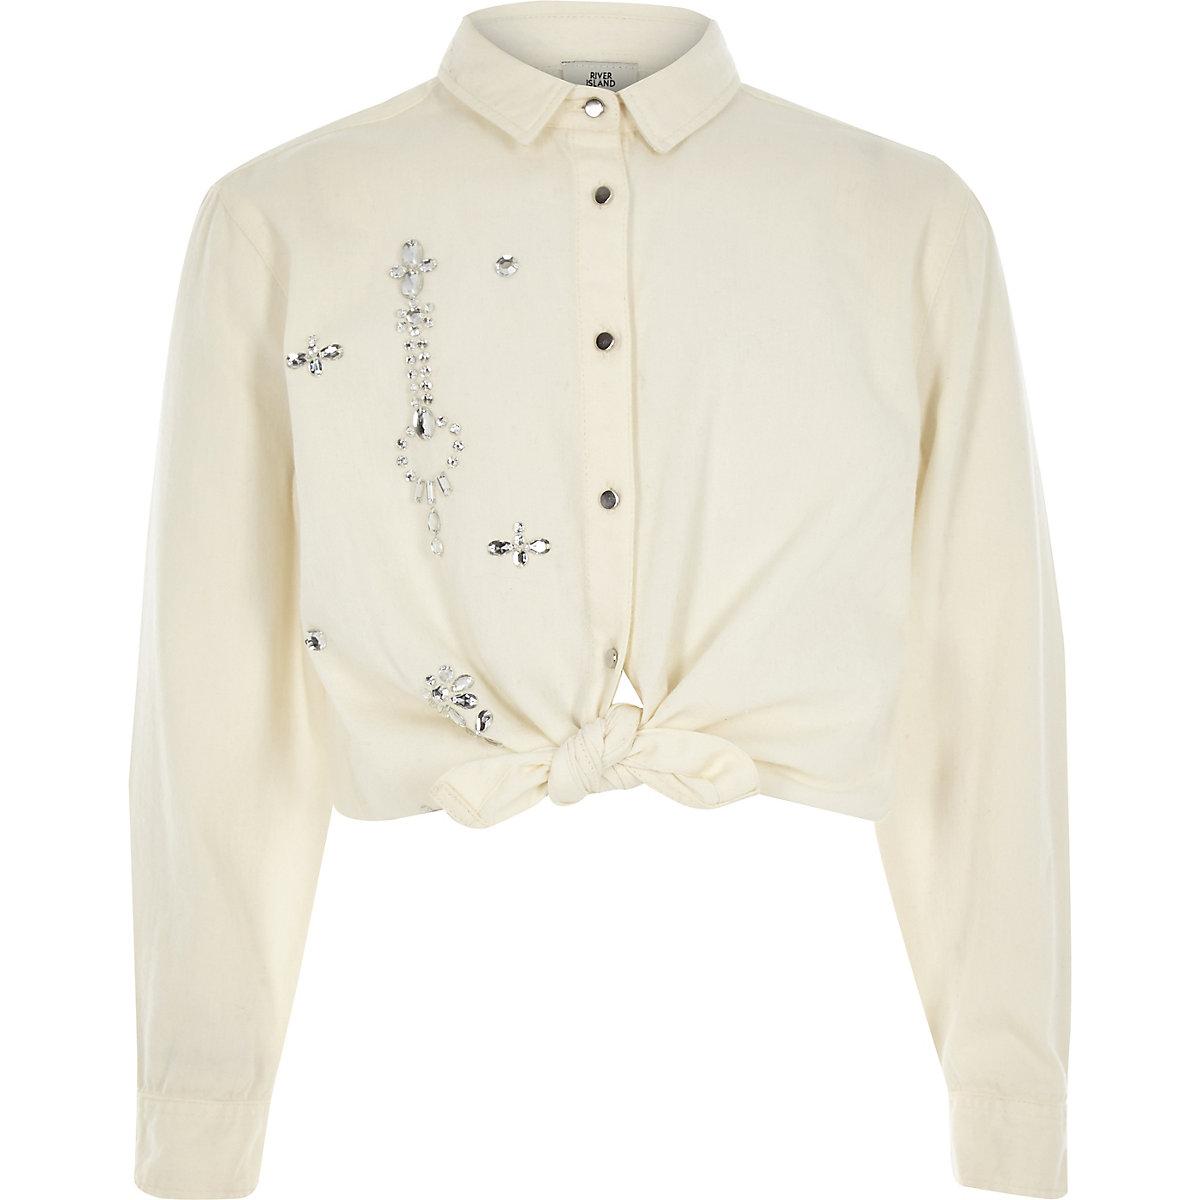 Girls white diamante tie front shirt